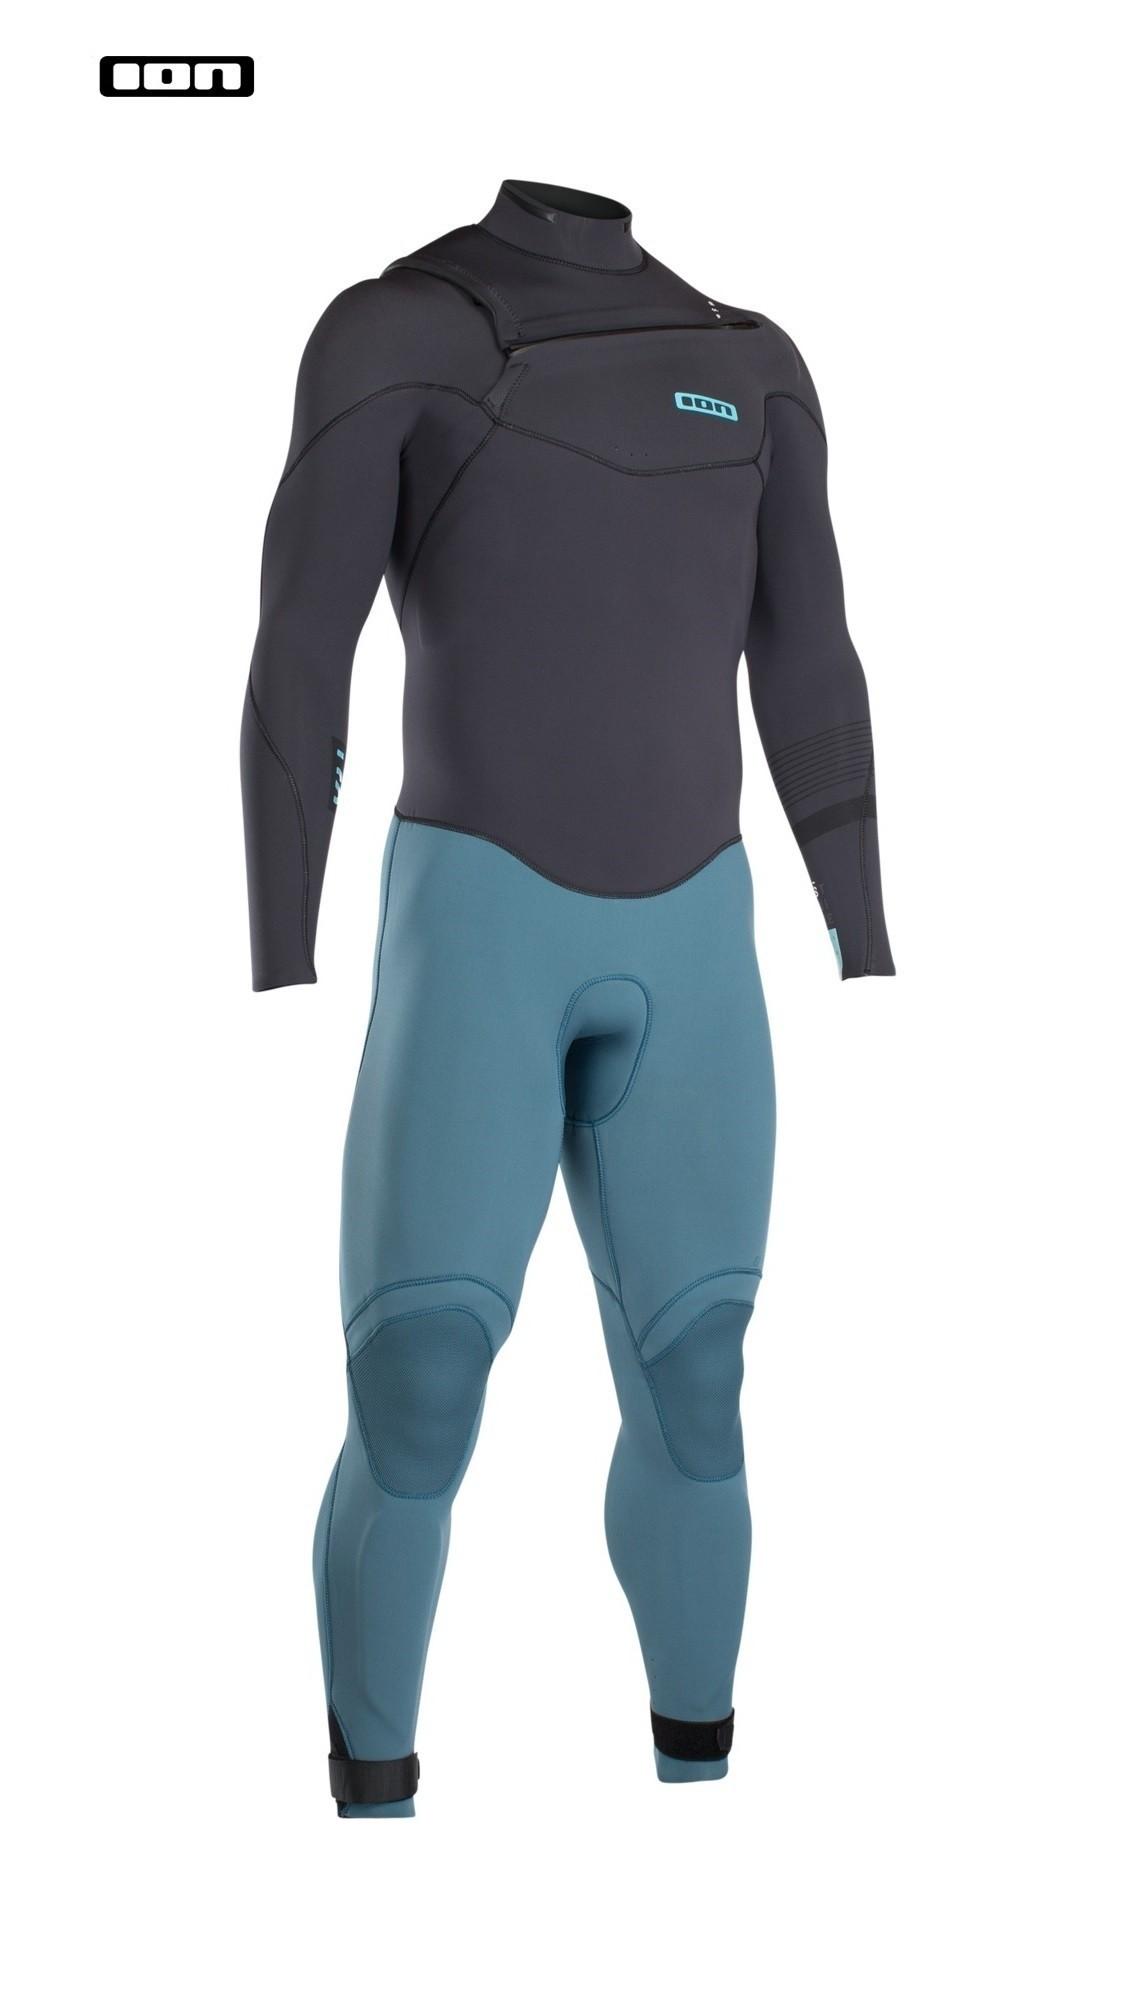 Ion wetsuit Strike Amp 5.5 front zip